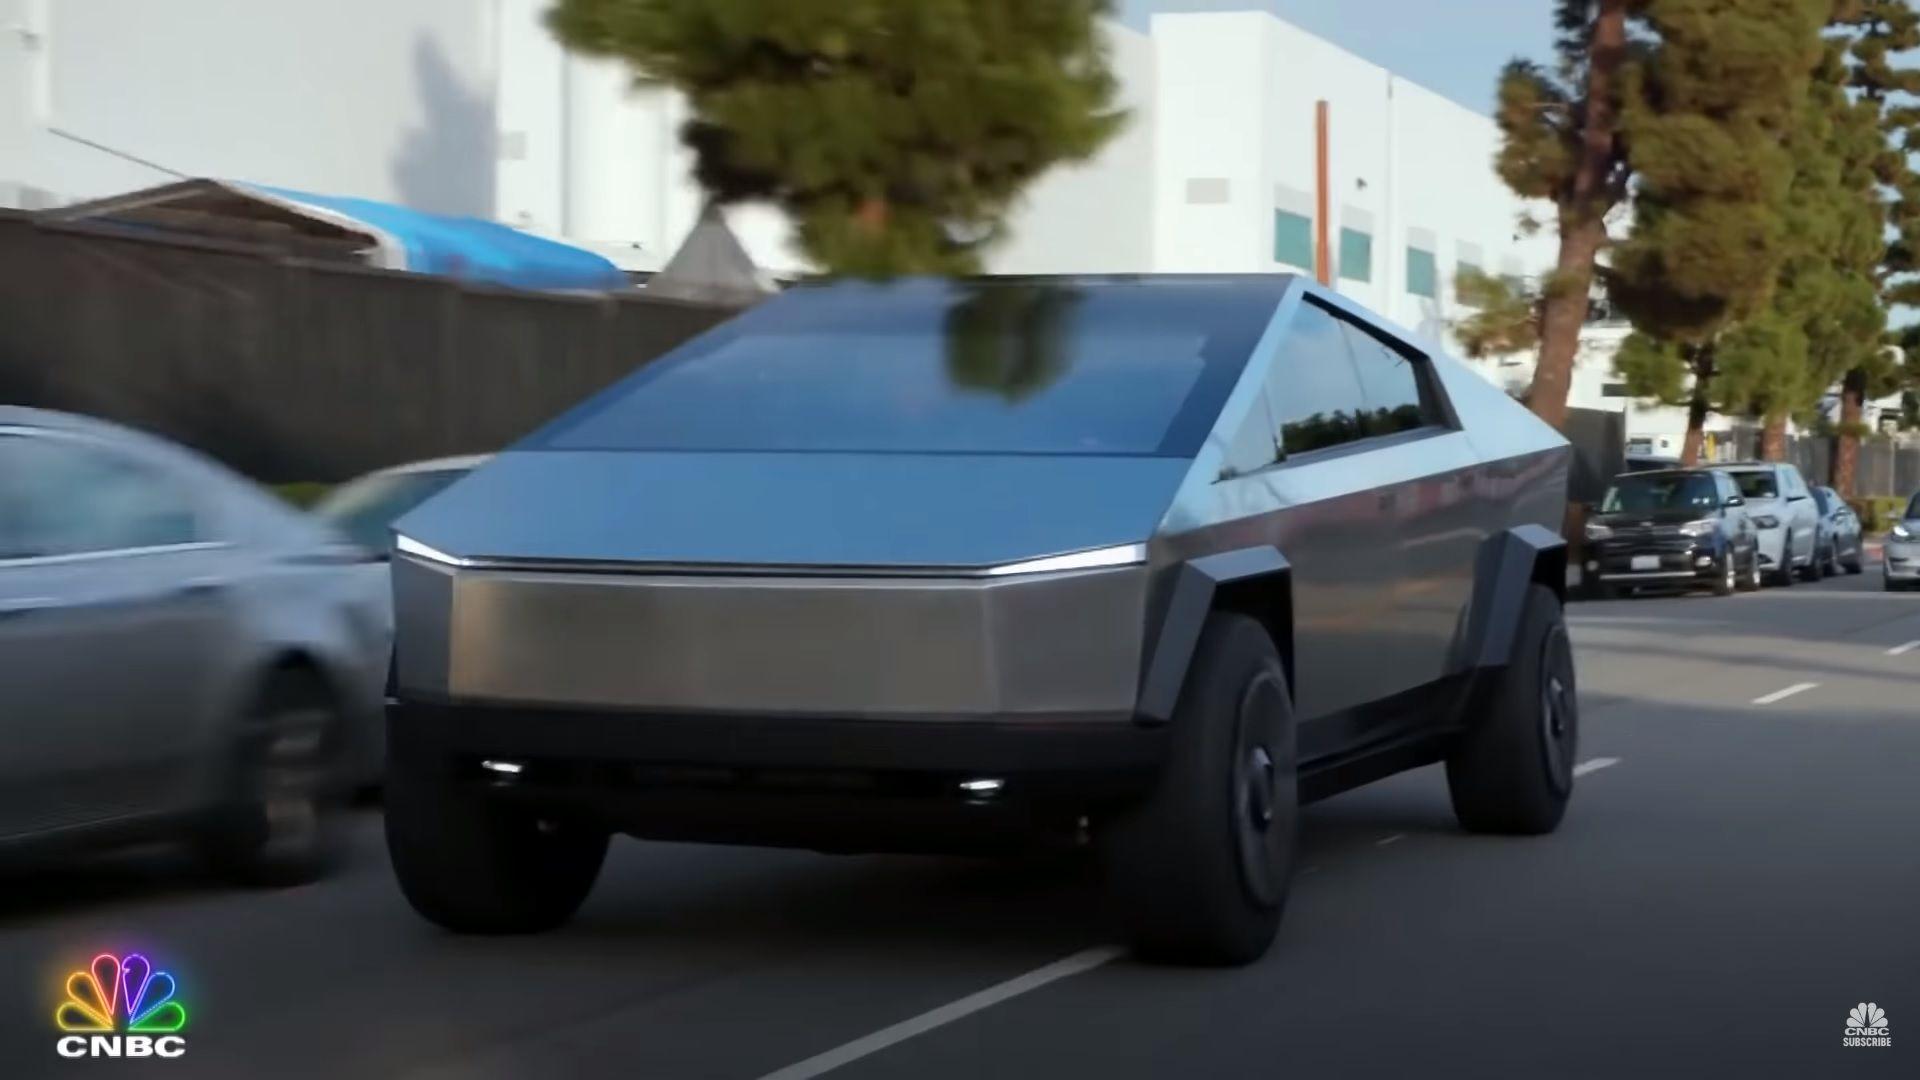 Elon Musk And Jay Leno Cruising In The Tesla Cybertruck Is Painfully Blissful Top Speed Tesla Car Tesla 2008 Corvette